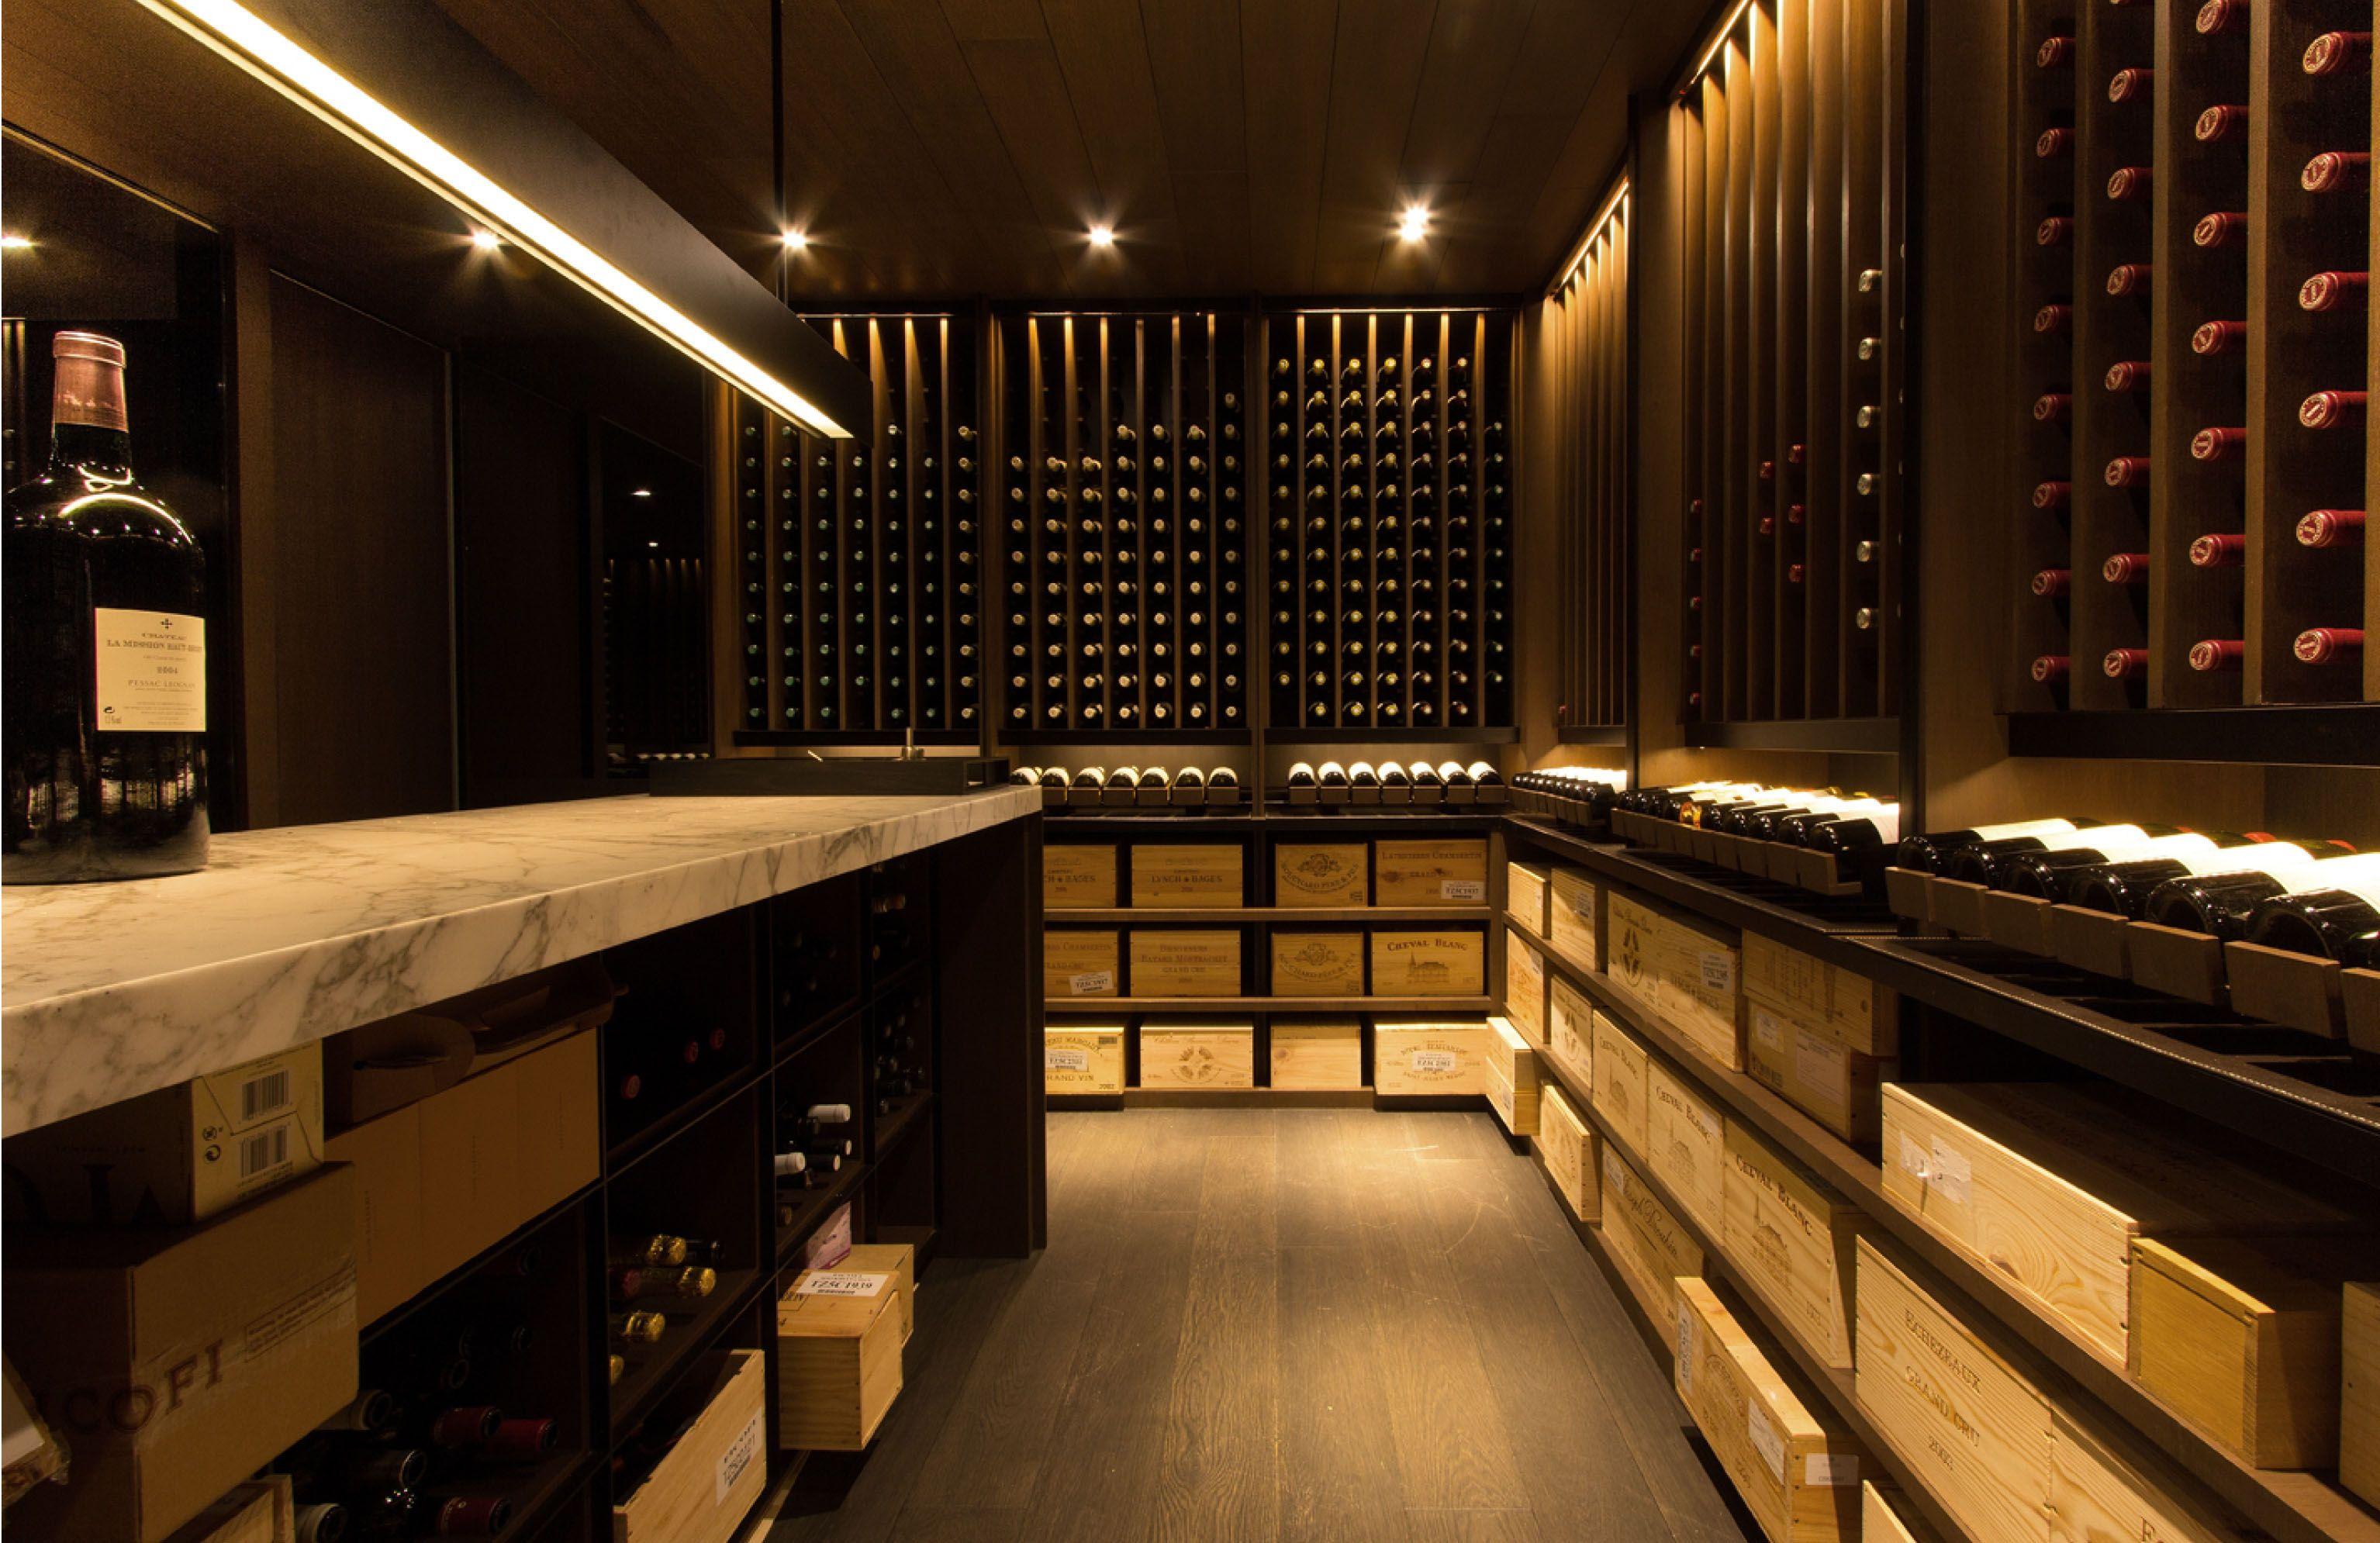 SCDA Holland Road, Singapore, Wine Cellar  Restaurants  Pinterest  Beautiful, Wine cellar and